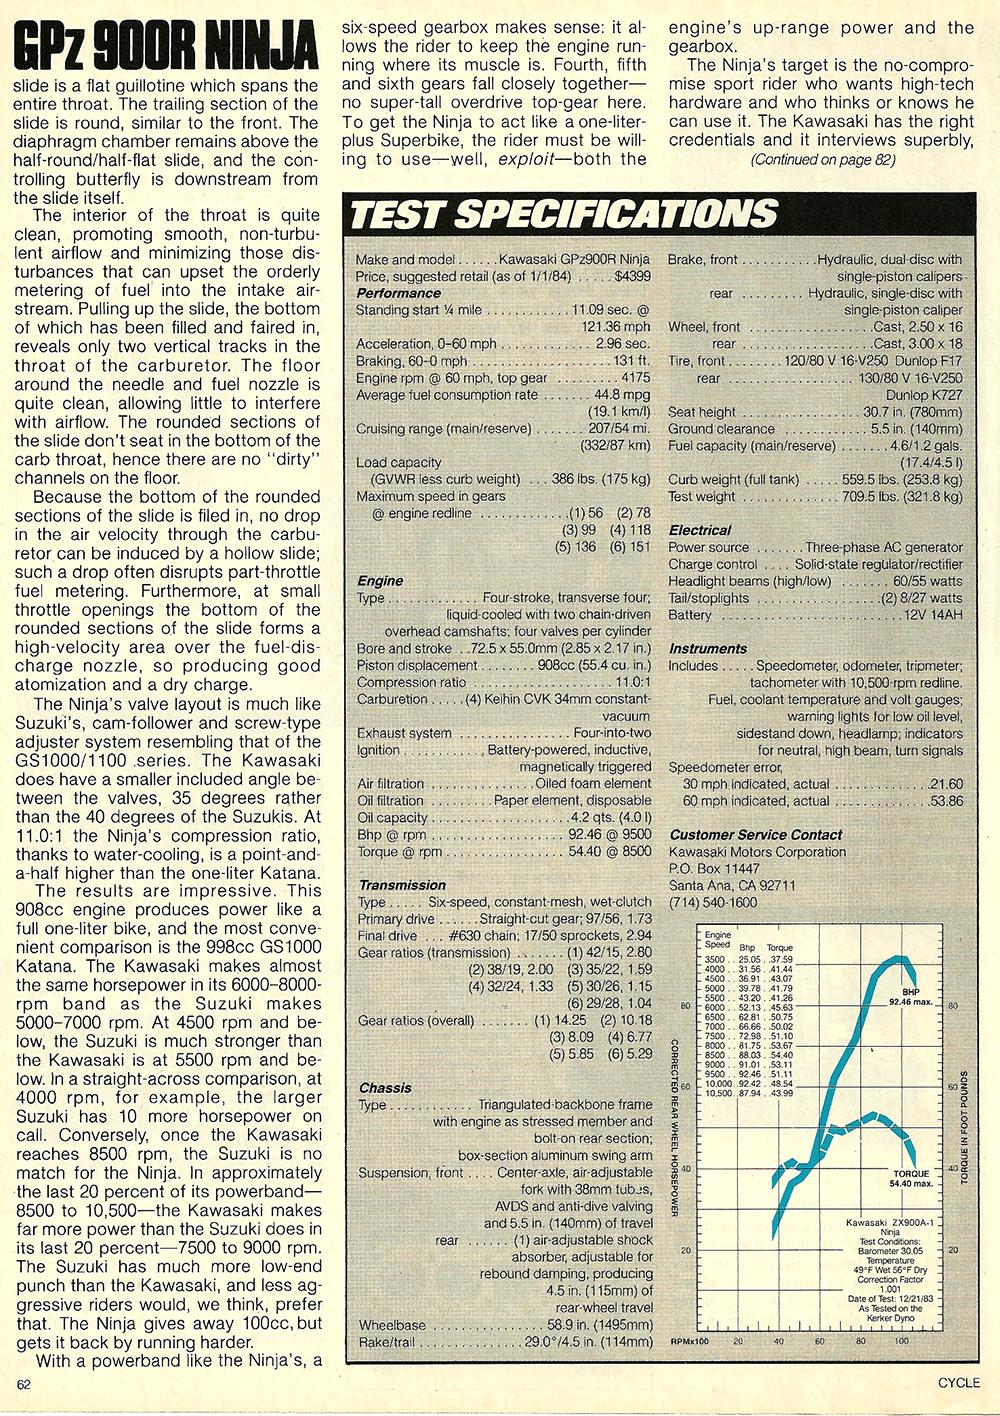 1984 Kawasaki GPz 900R Ninja road test 08.jpg